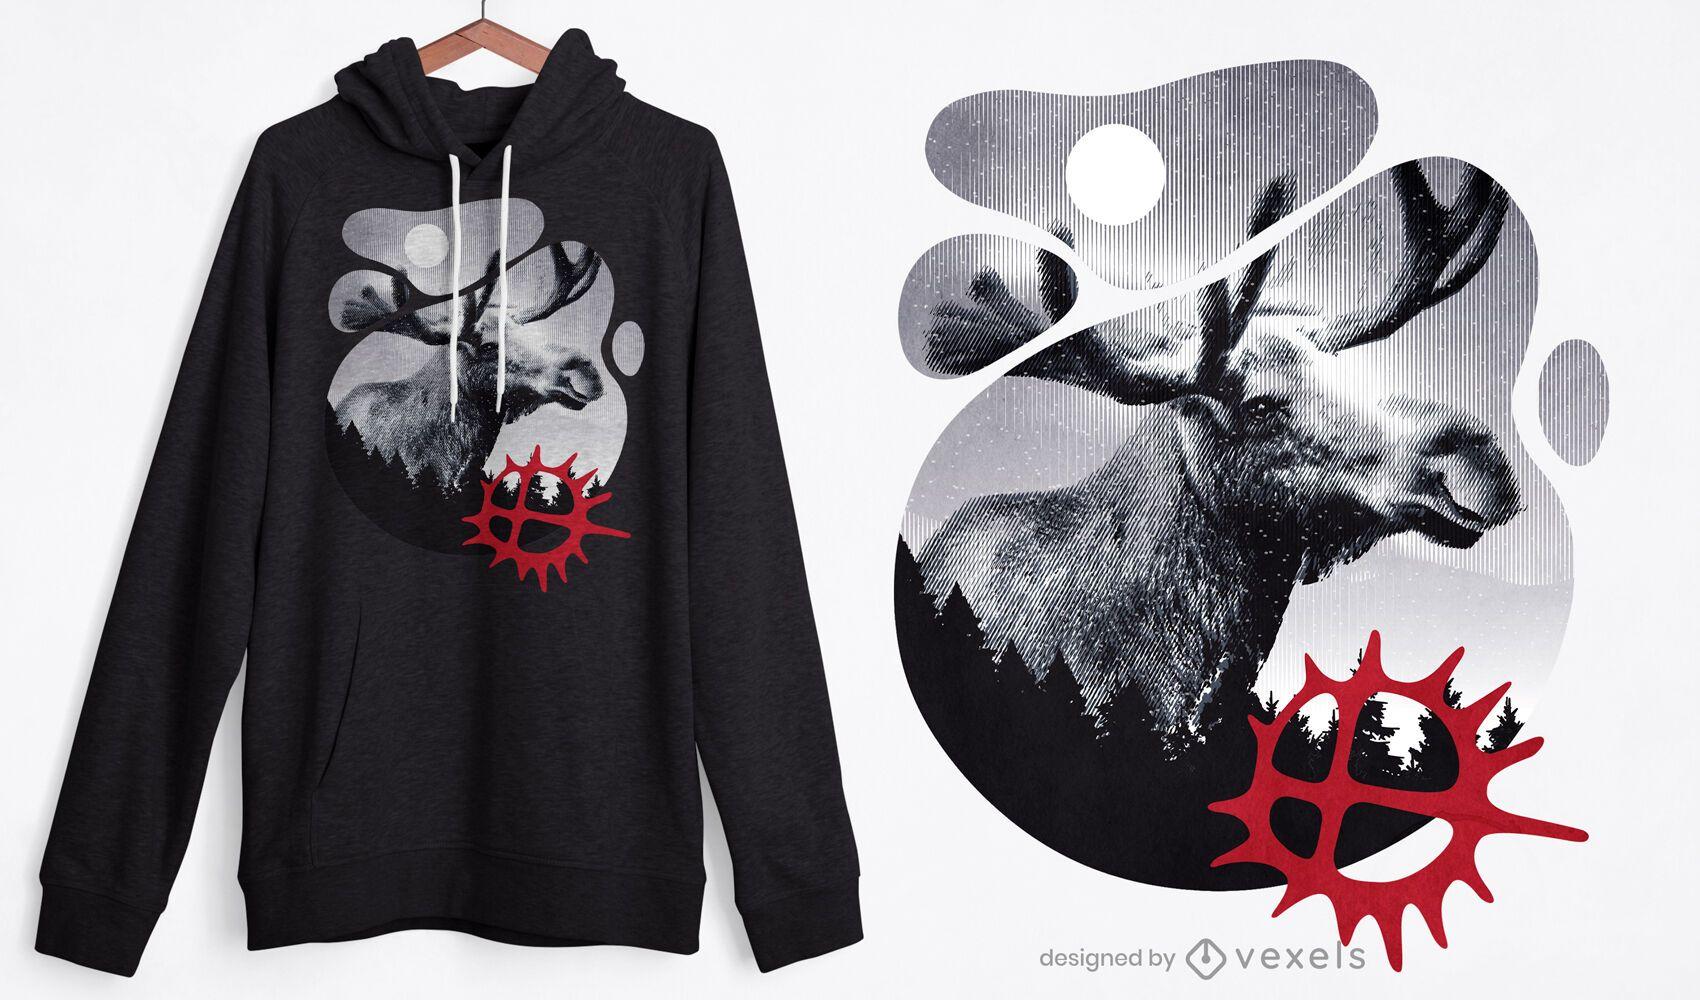 Elch Natur T-Shirt Design